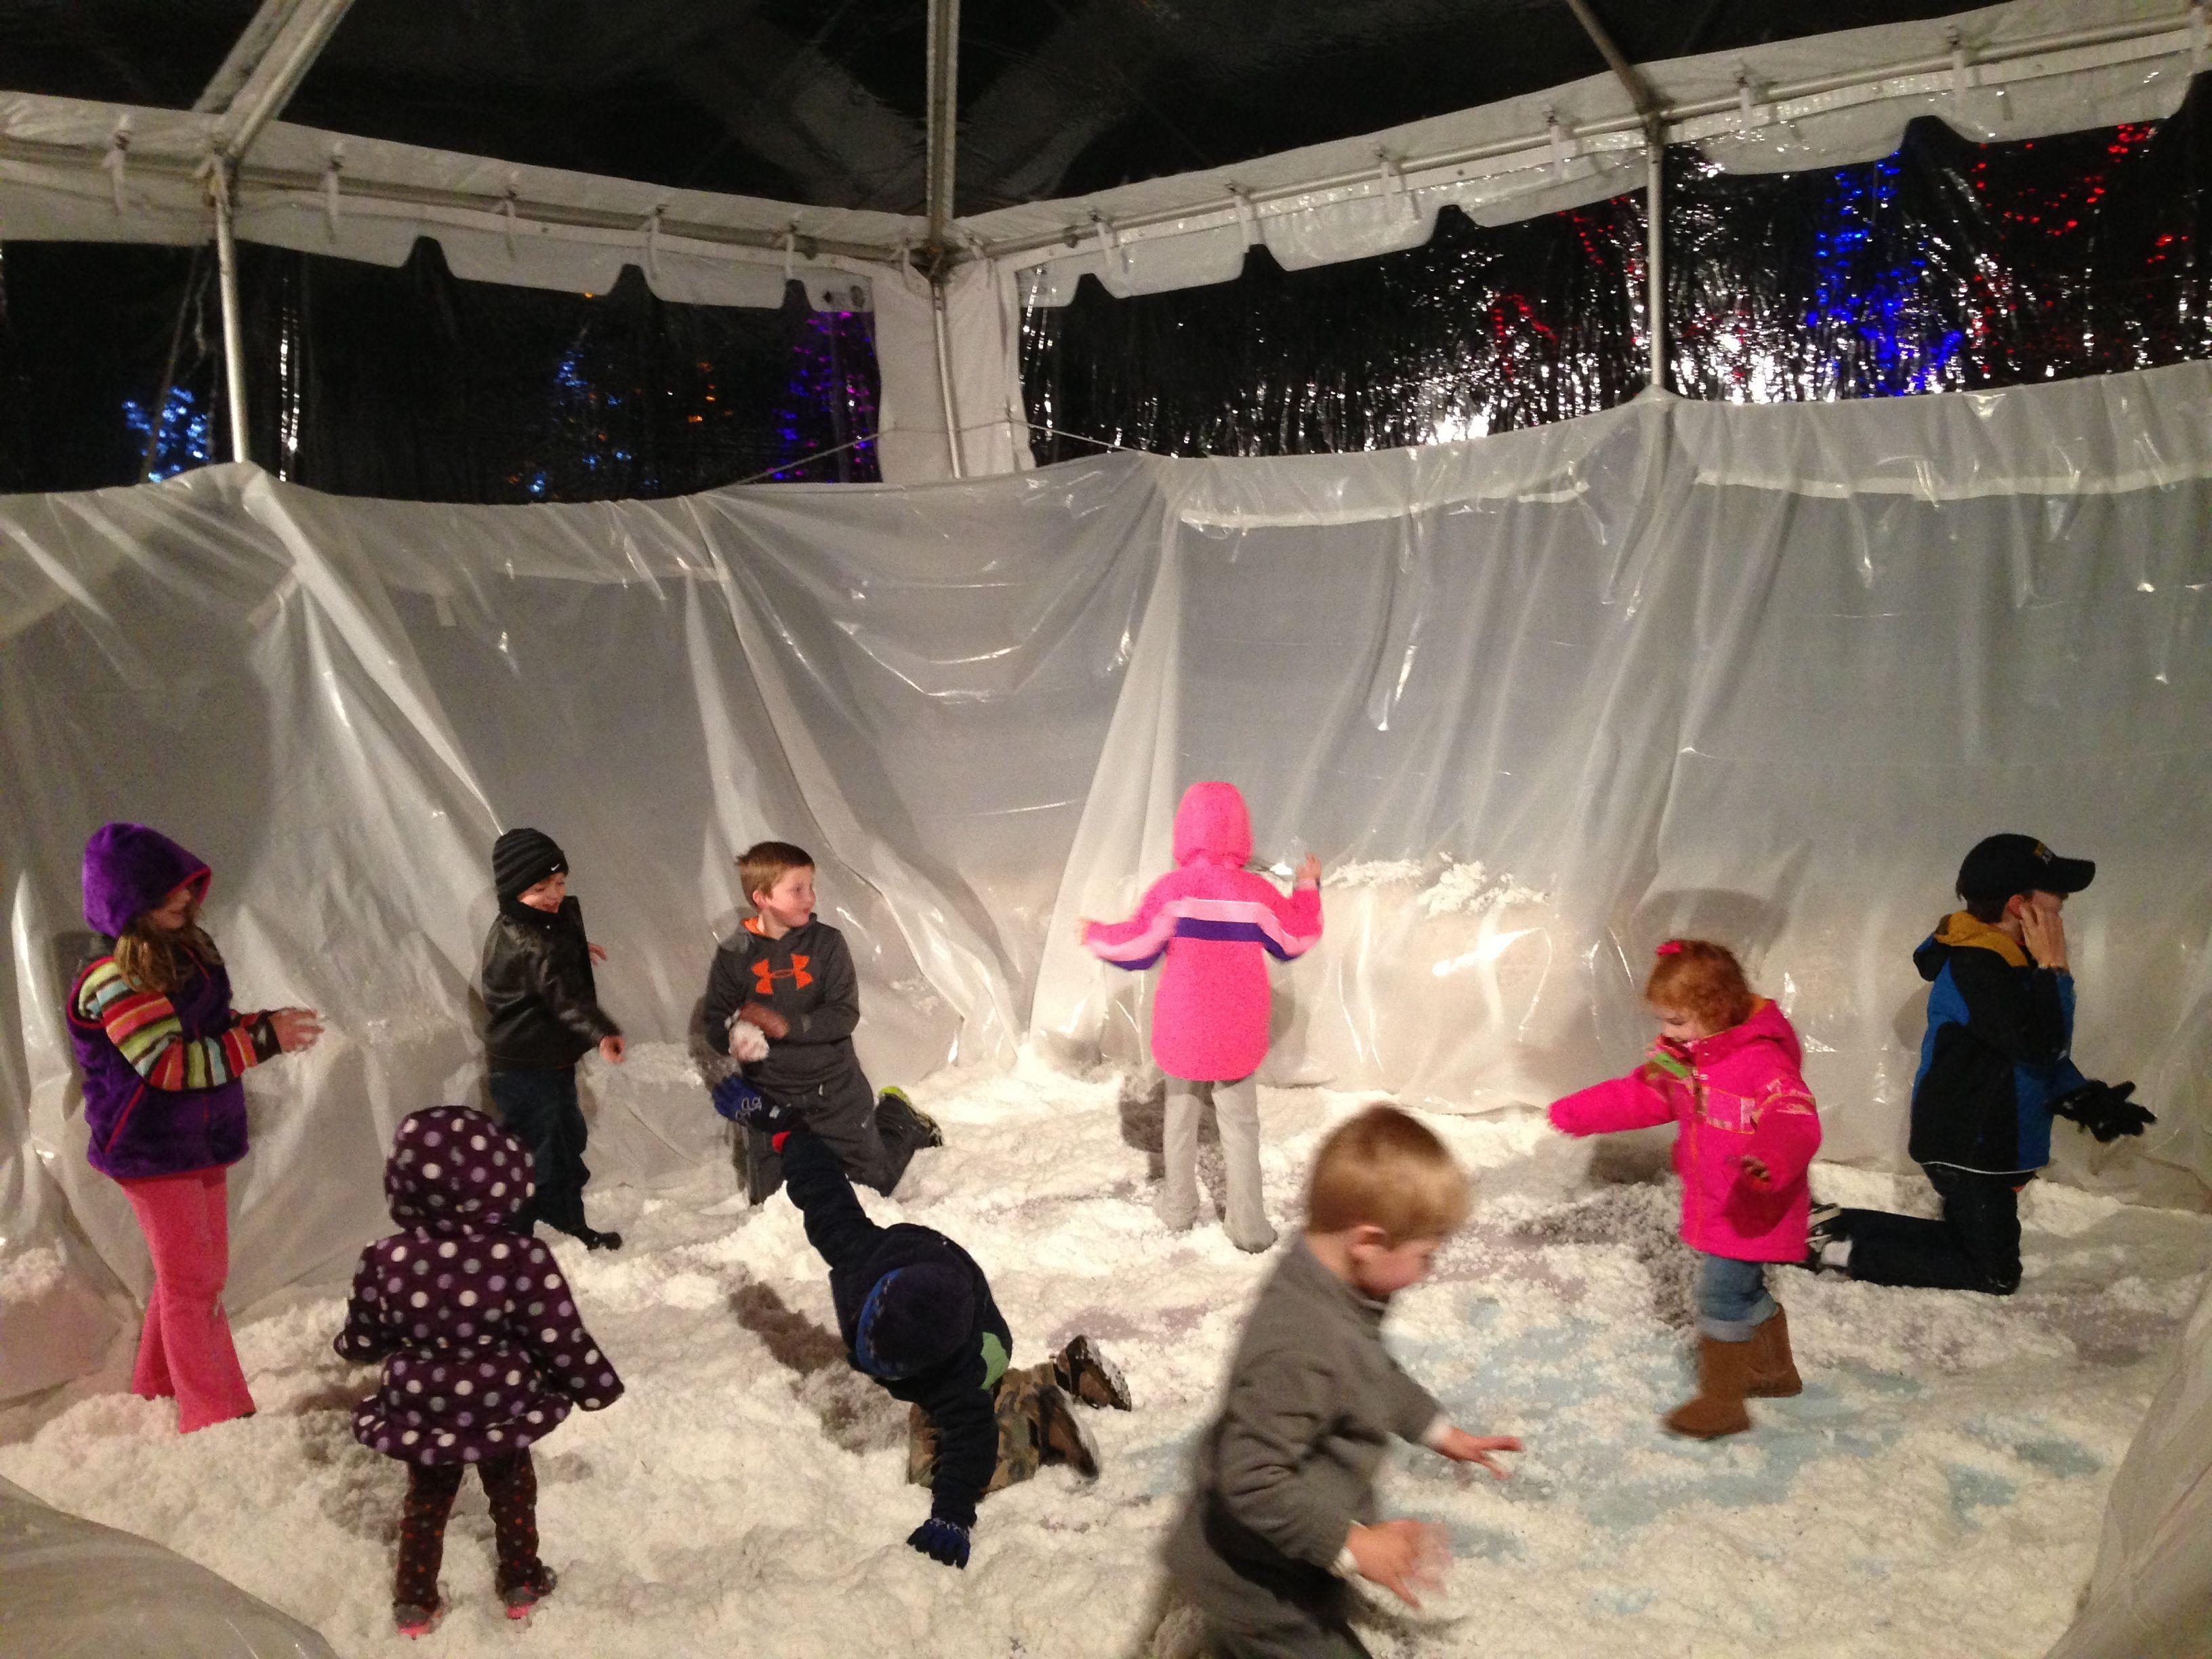 Snowy Nights at My Big Backyard | Snowy, Big backyard ...